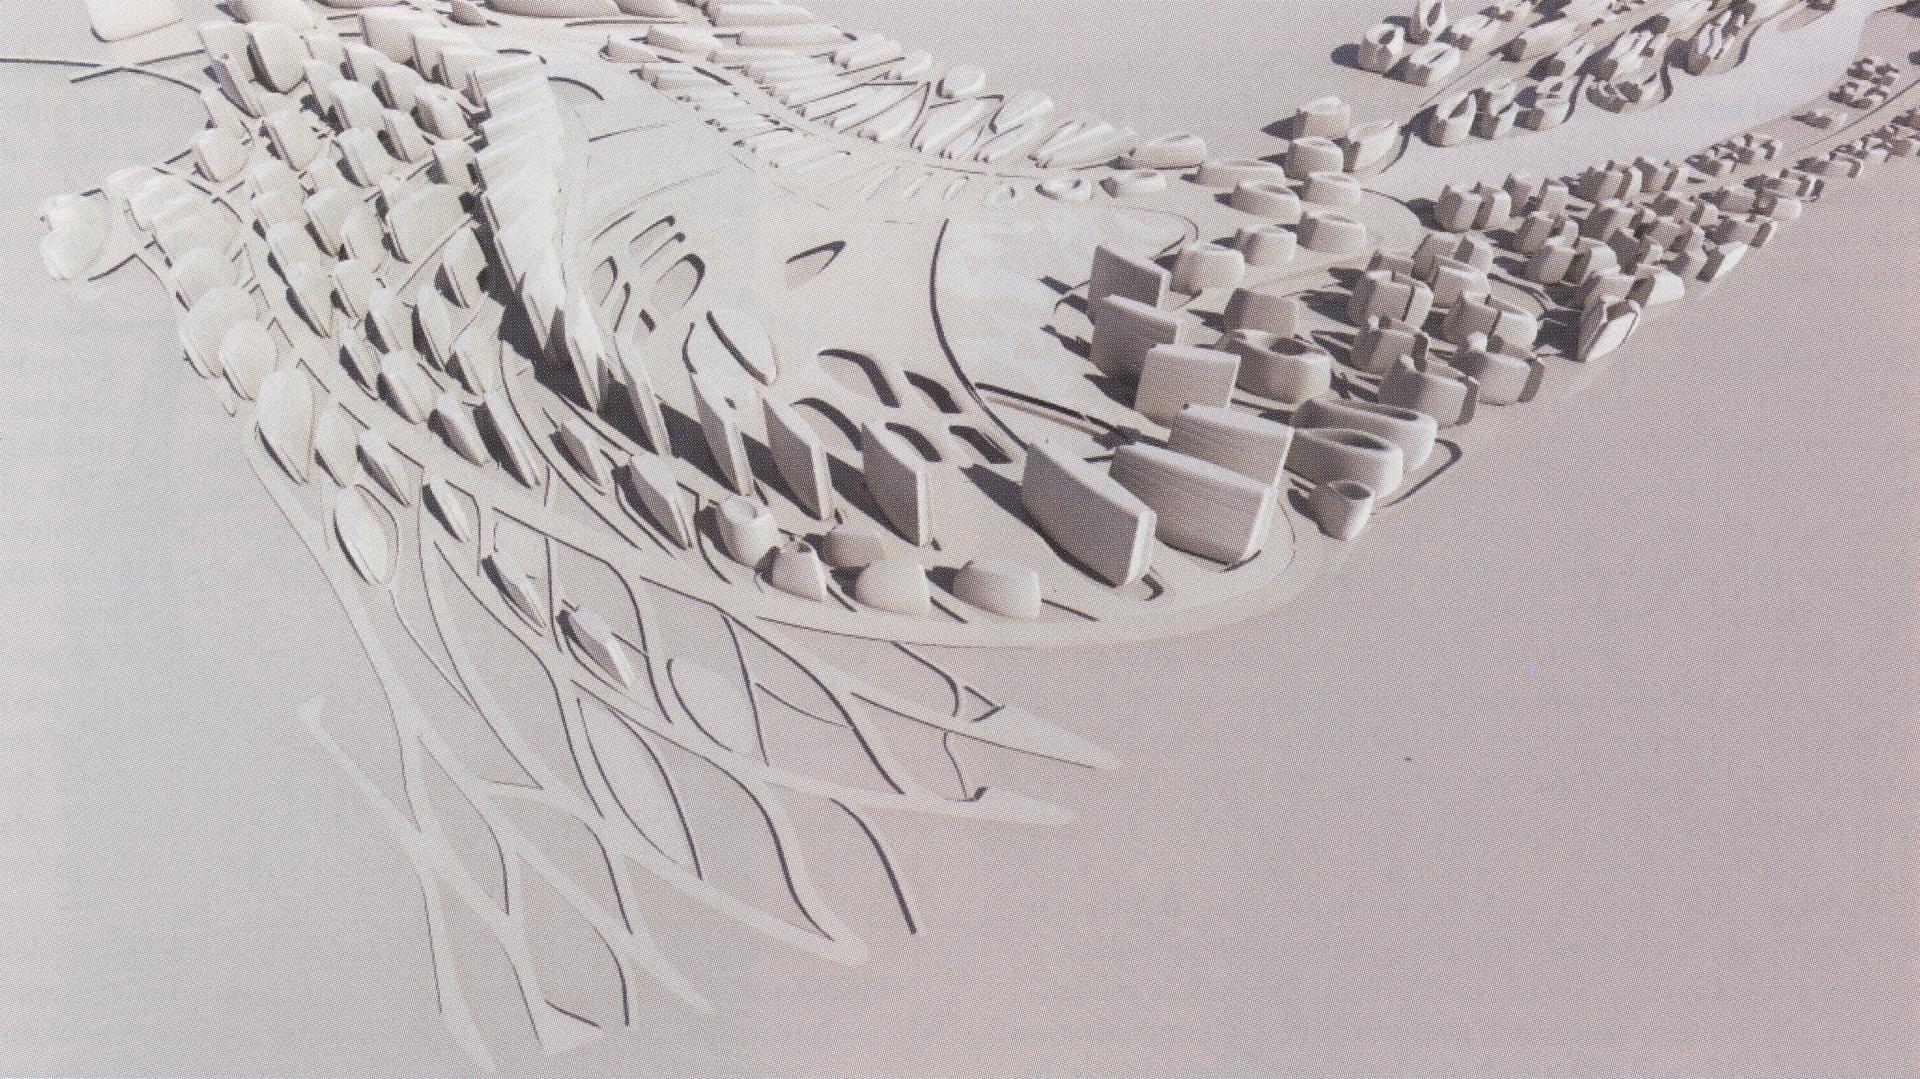 ©2008, Nils Fischer, Parametric Urbanism, Procedural Complexity